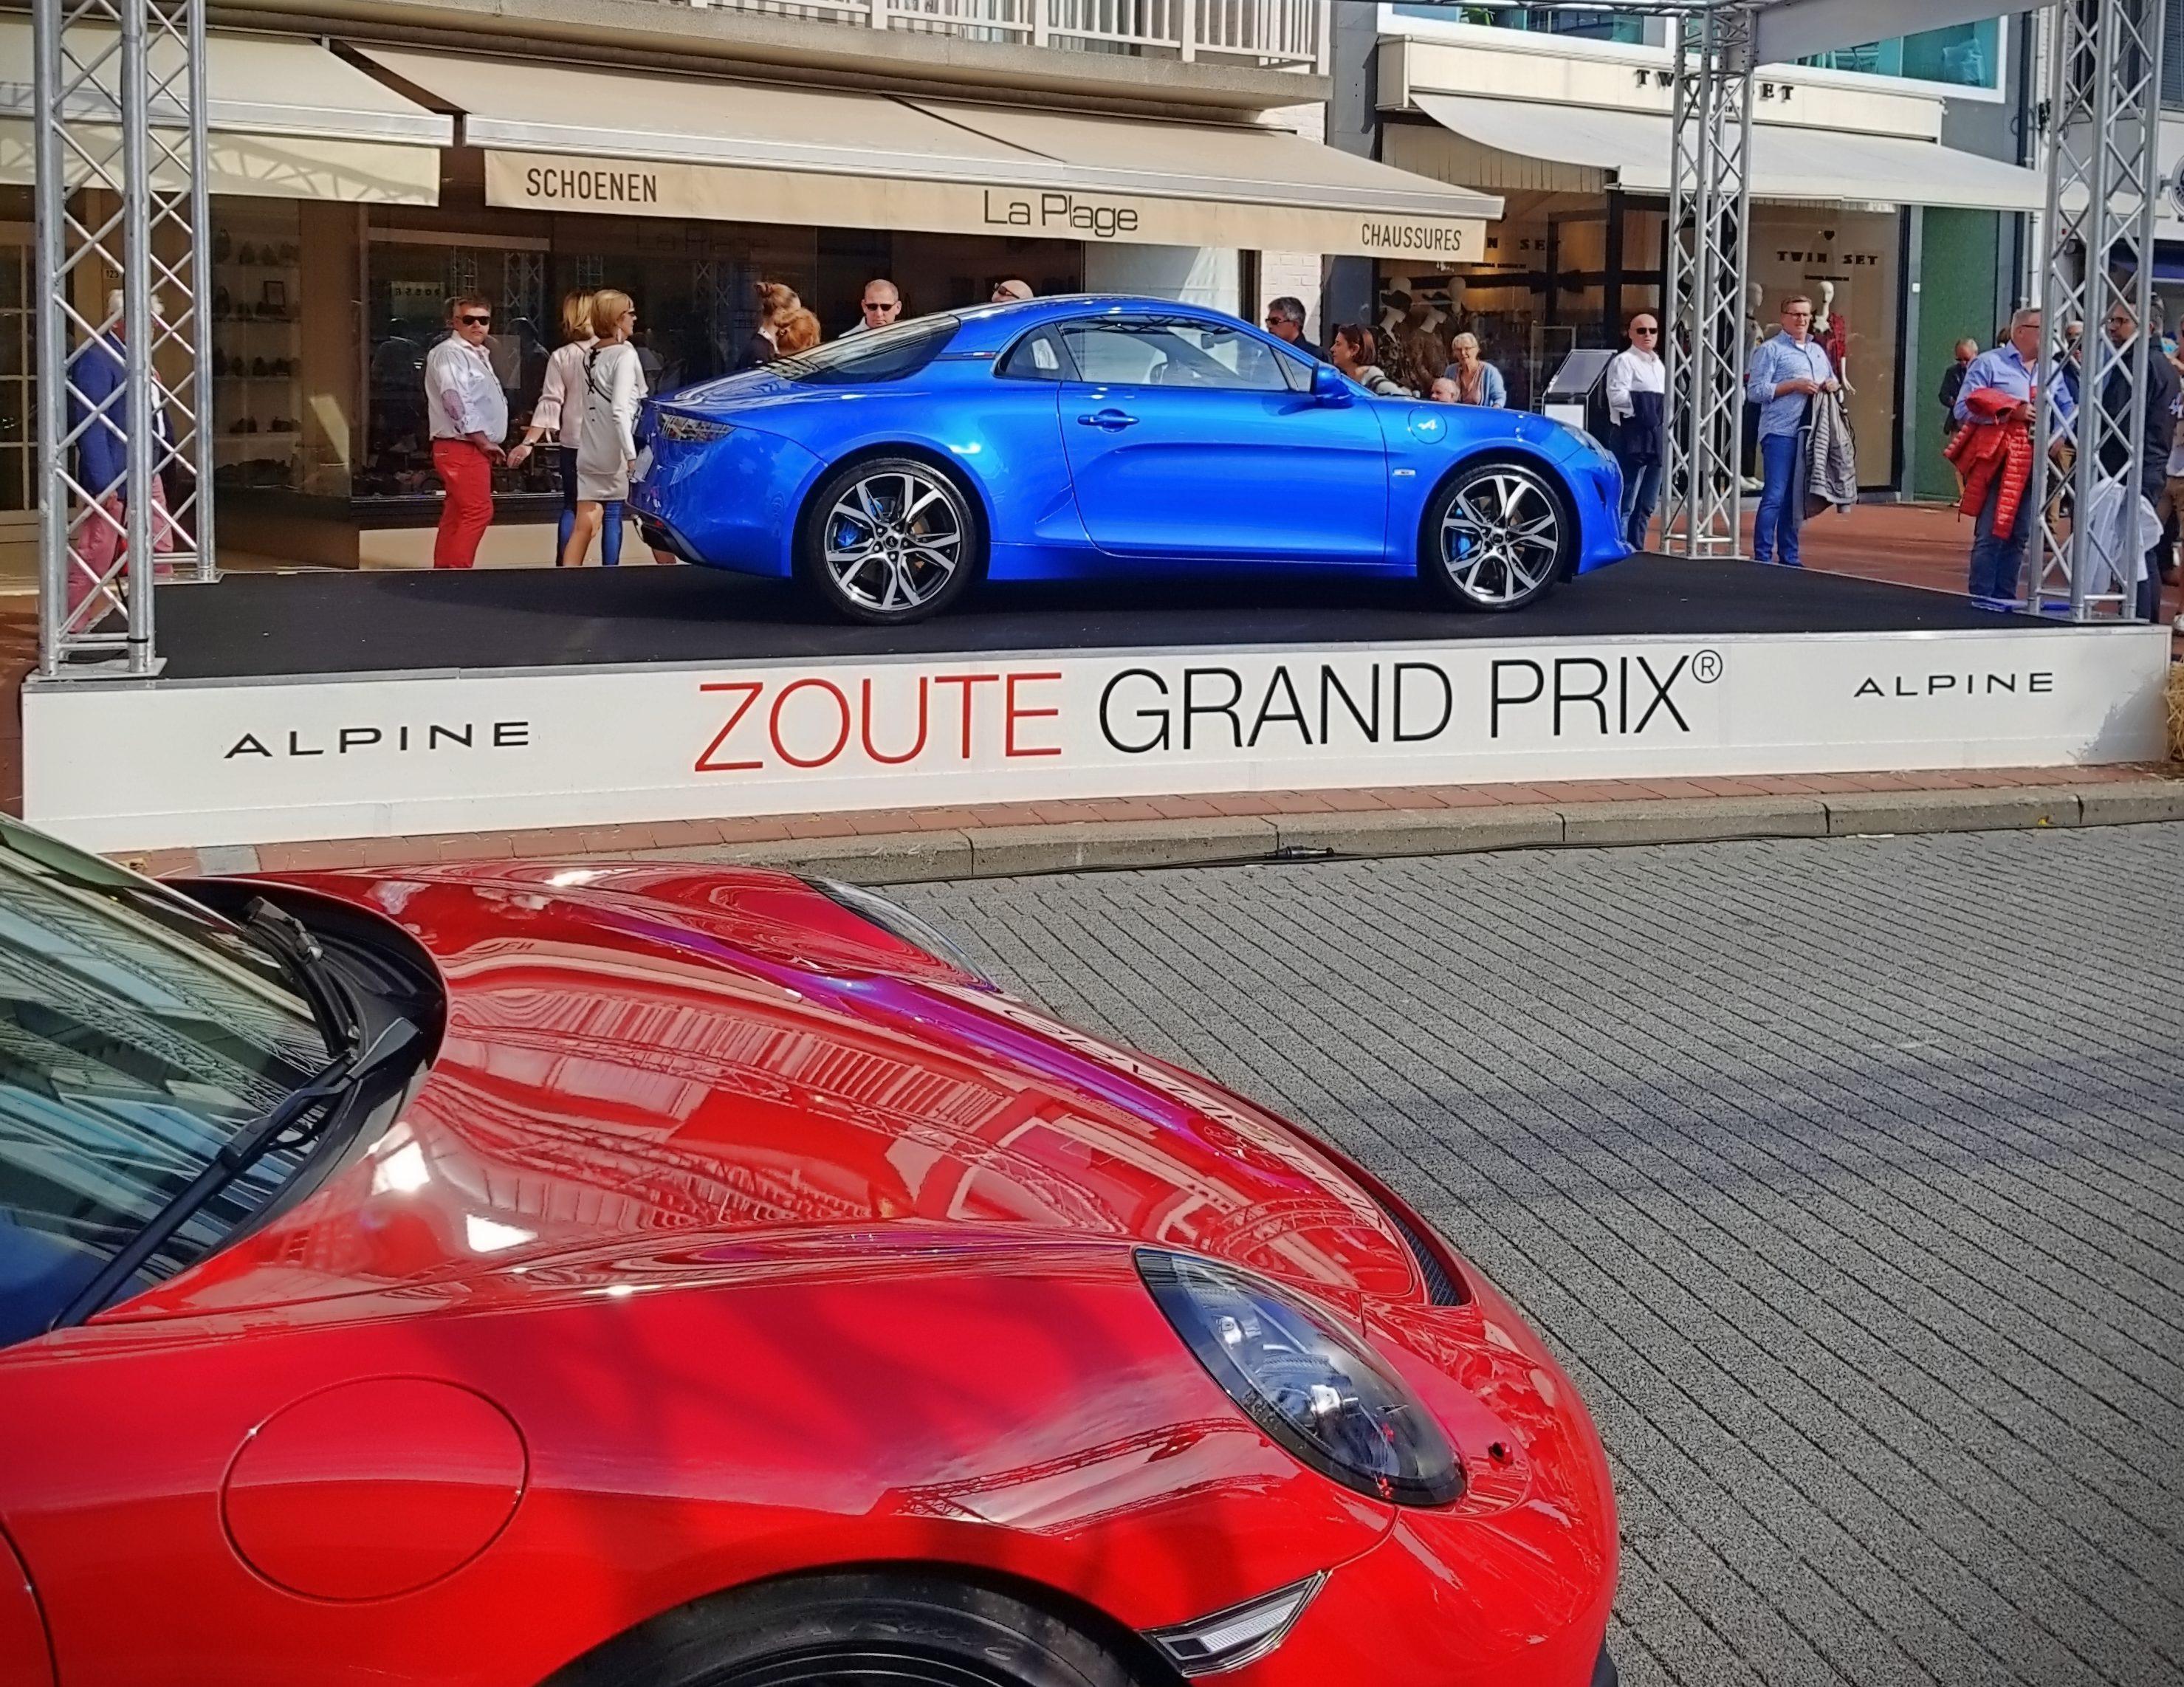 Zoute Grand Prix 2018, luxe, calme et beaucoup de raretés